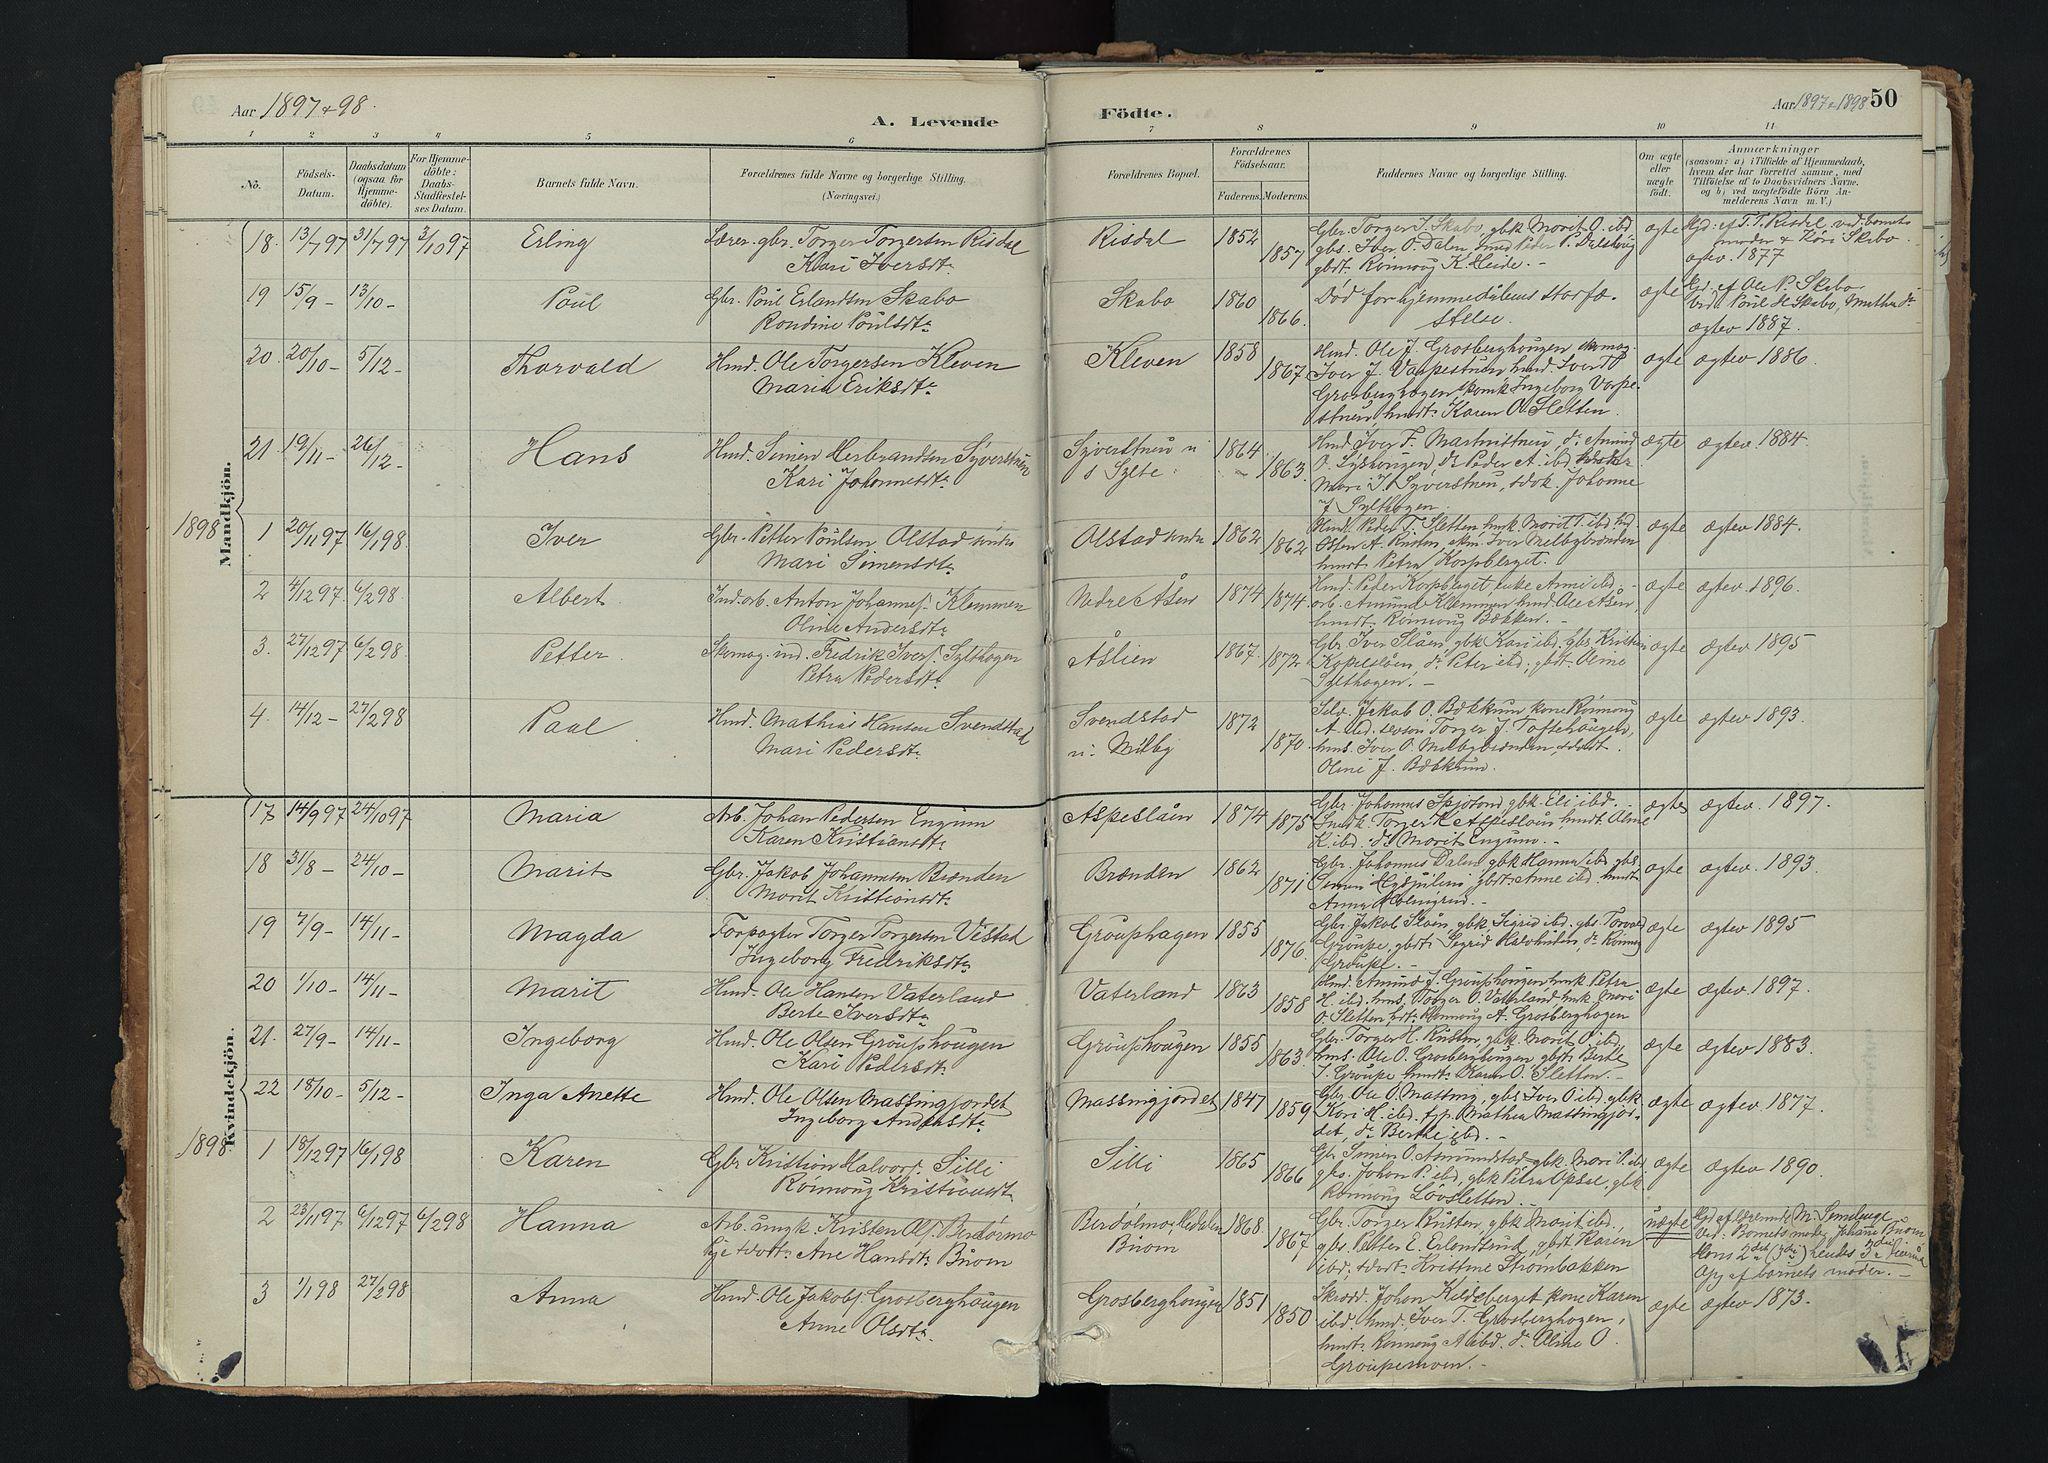 SAH, Nord-Fron prestekontor, Ministerialbok nr. 5, 1884-1914, s. 50